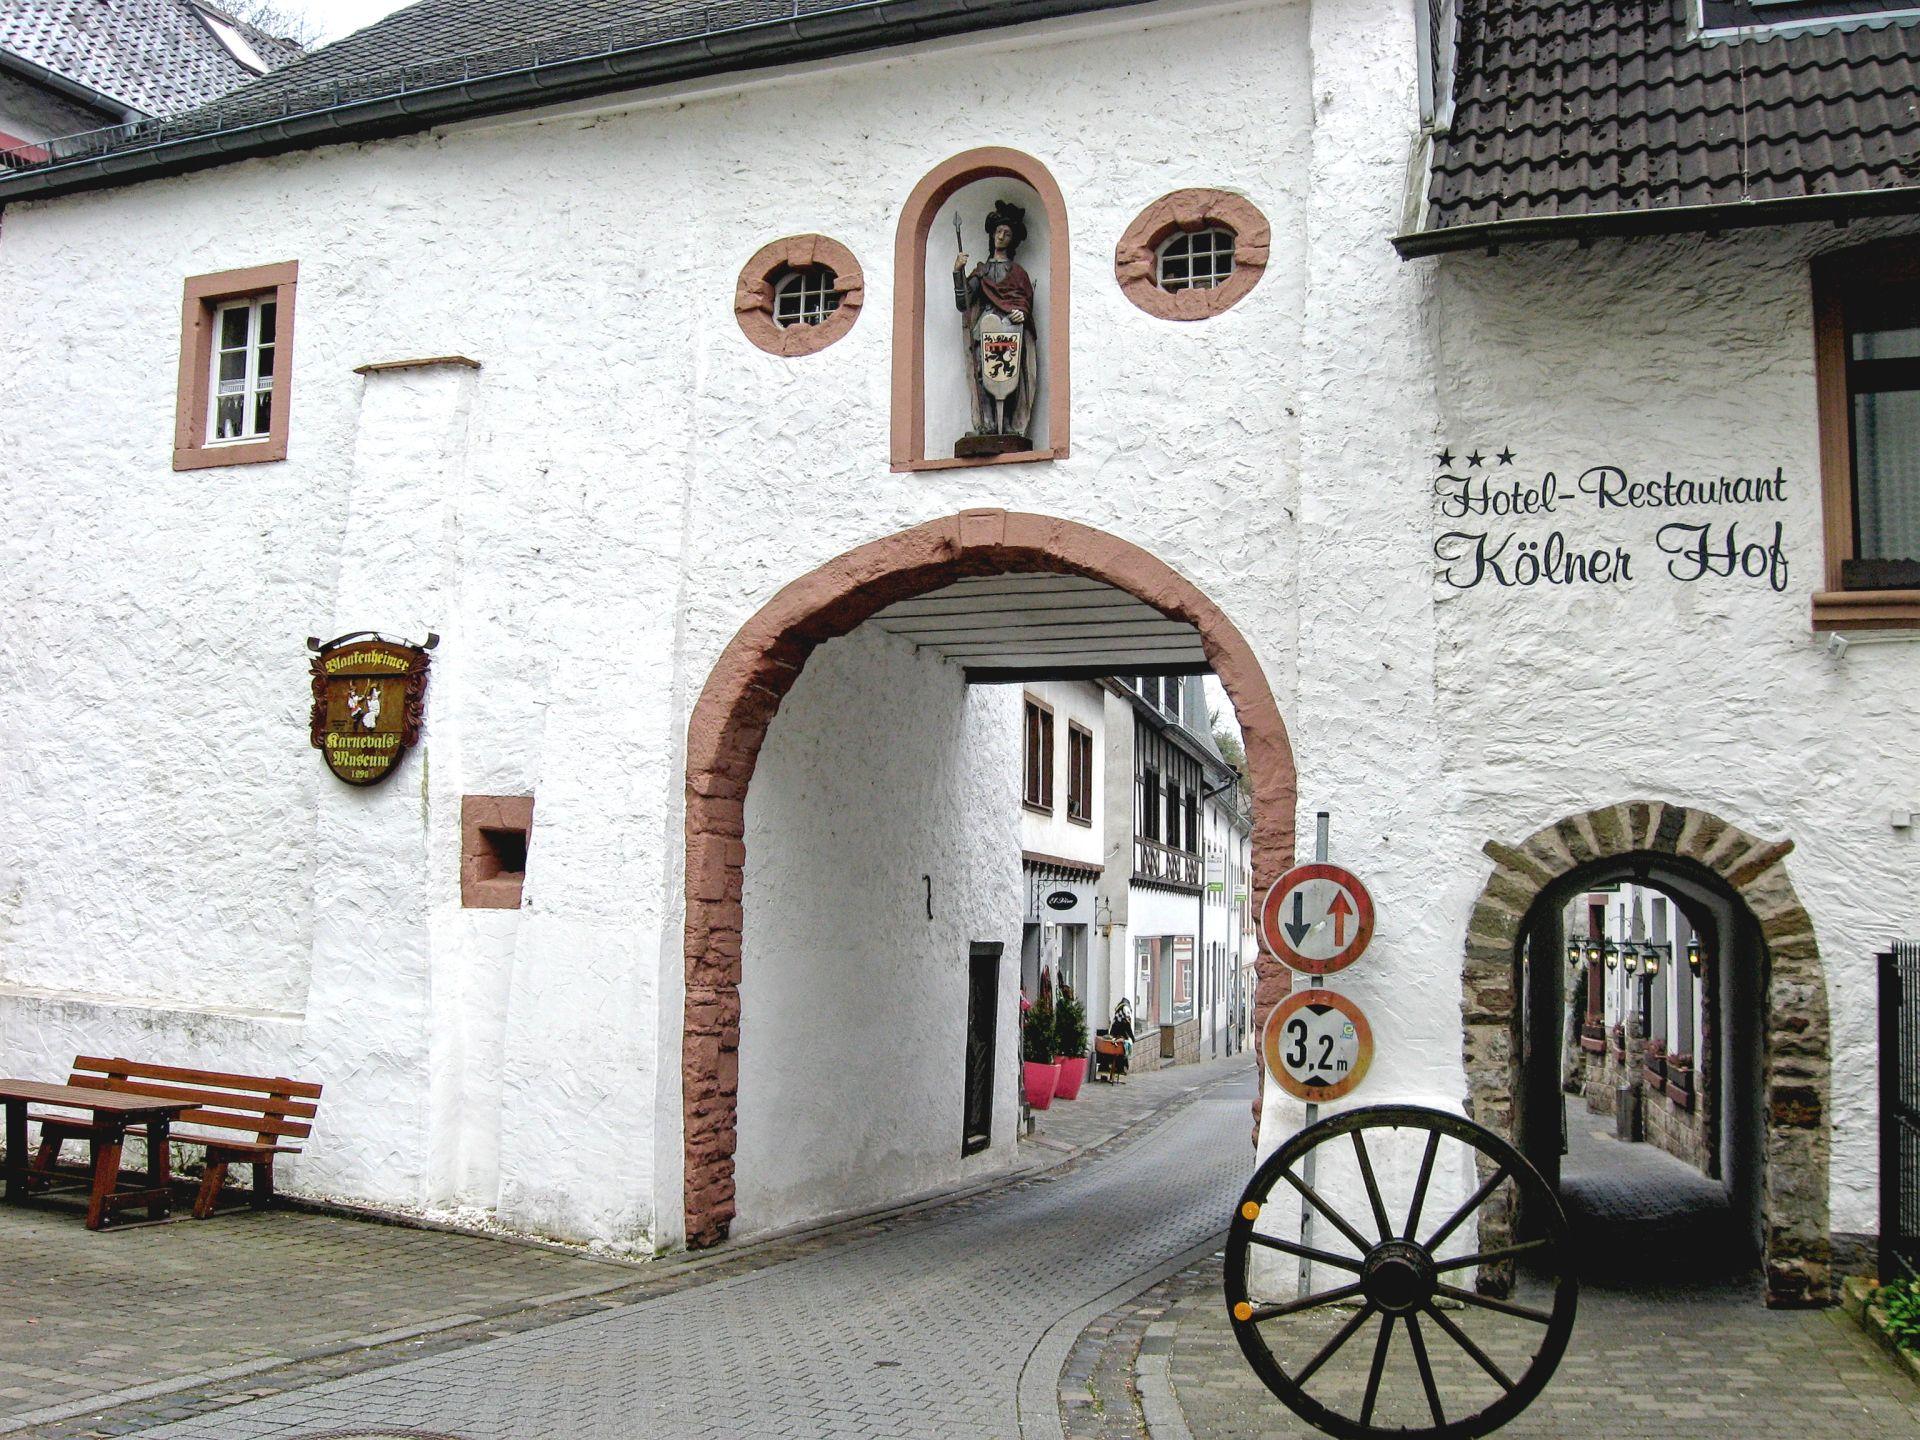 The Gate of St. George, Georgtor, Blankenheim, Germany, Complete travel guide of Blankenheim, Germany, Eifel valley, Ahr valley, the castle of Blankenheim, the spring of Ahr